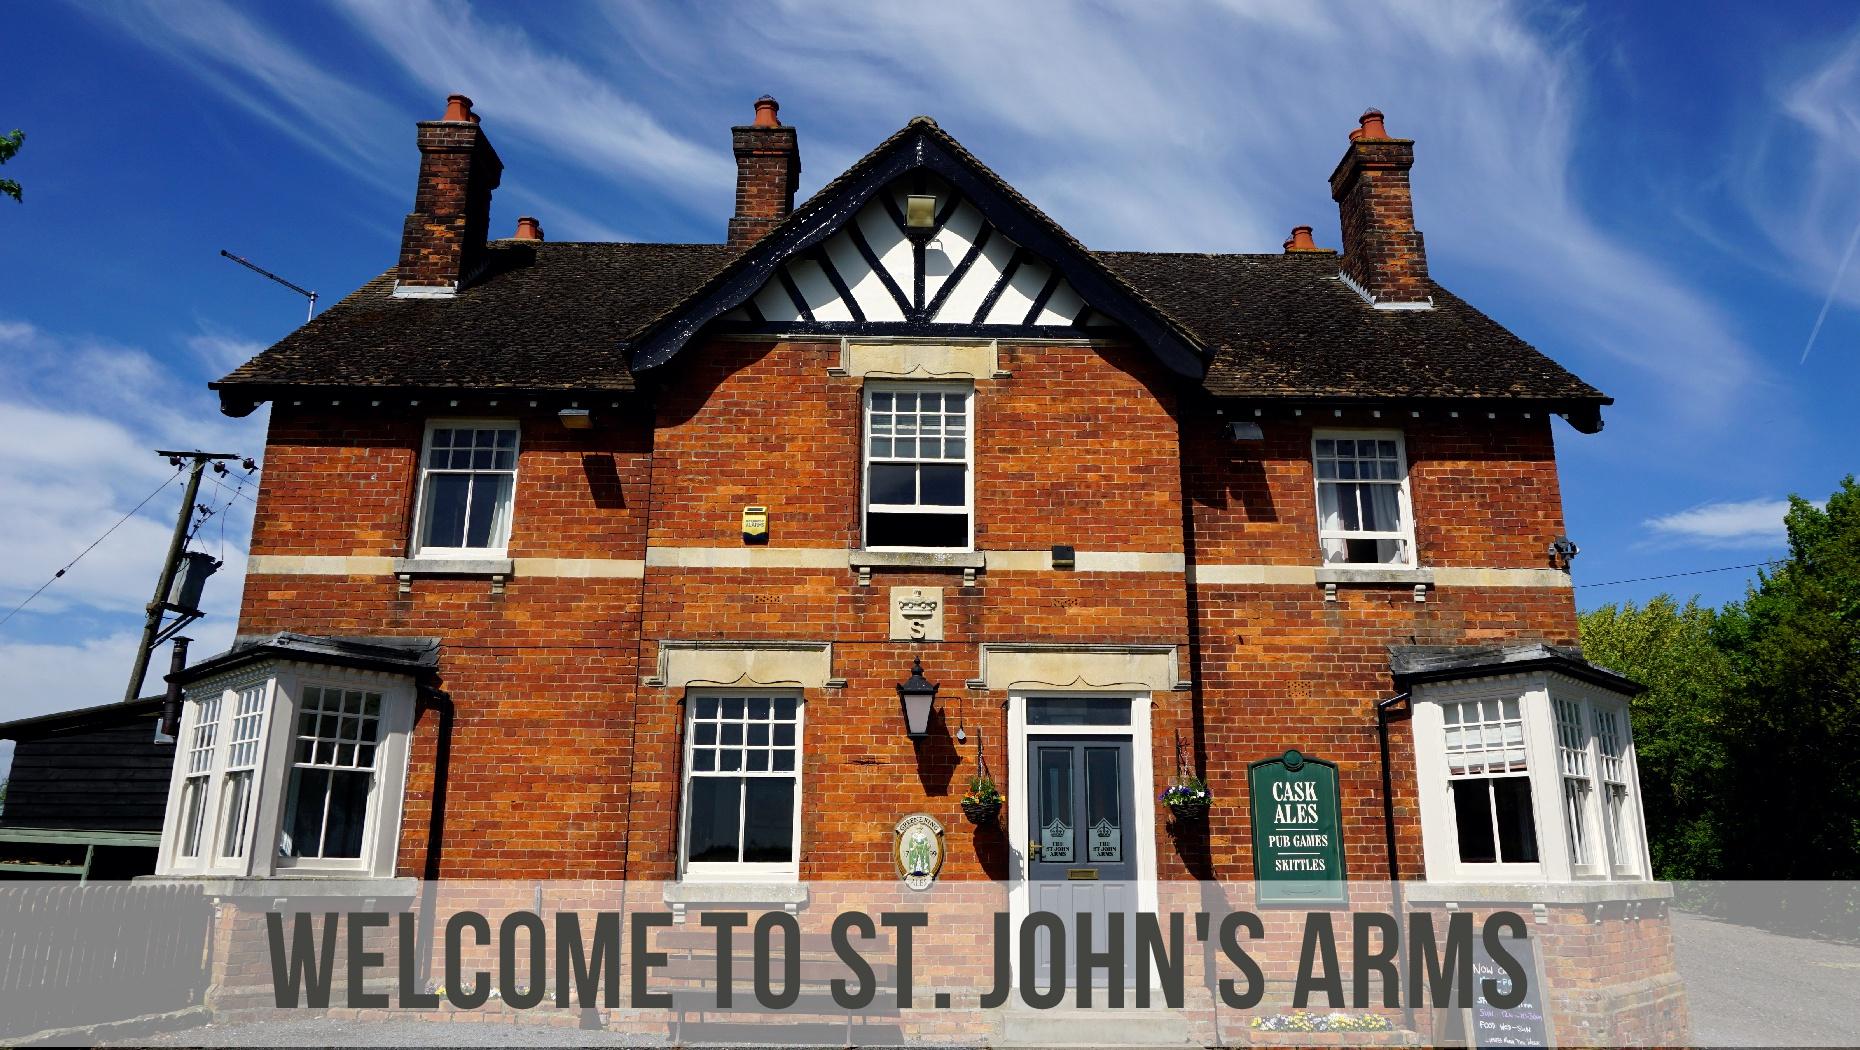 st_johns_arms_melchbourne_bedford_pub.jpg